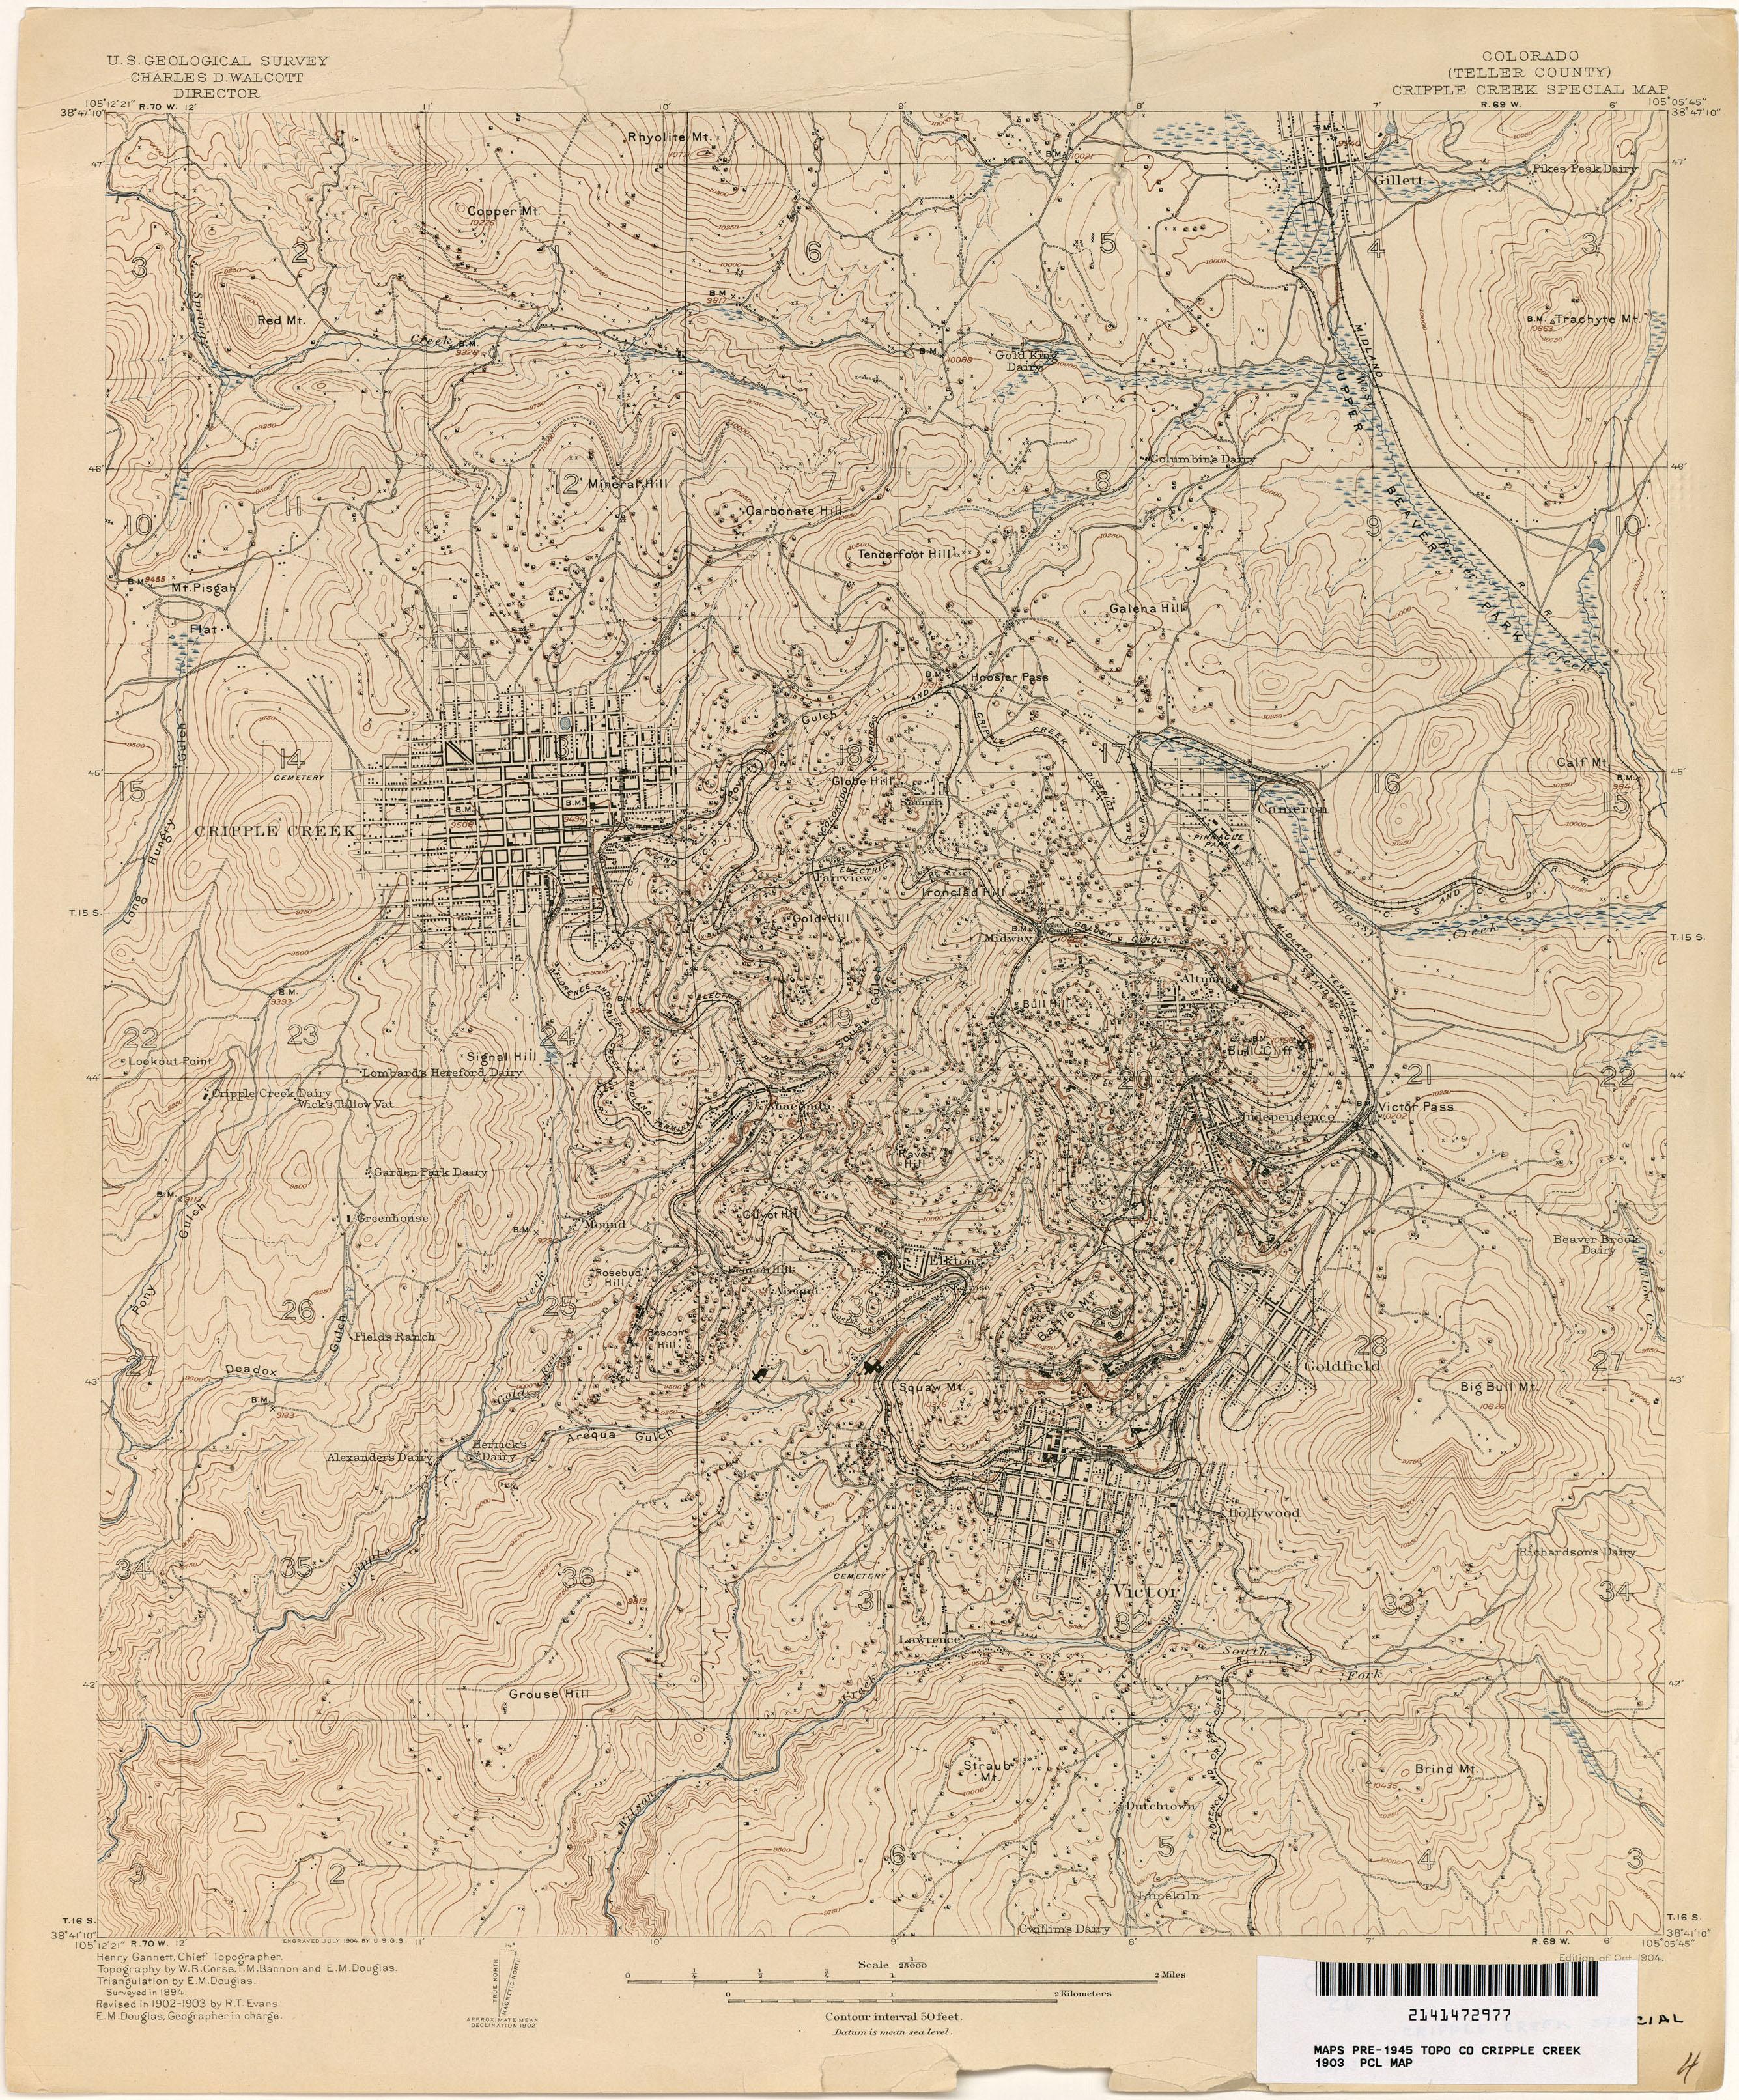 Topographic Maps Topos Maps And Geospatial Information - Colorado topo maps